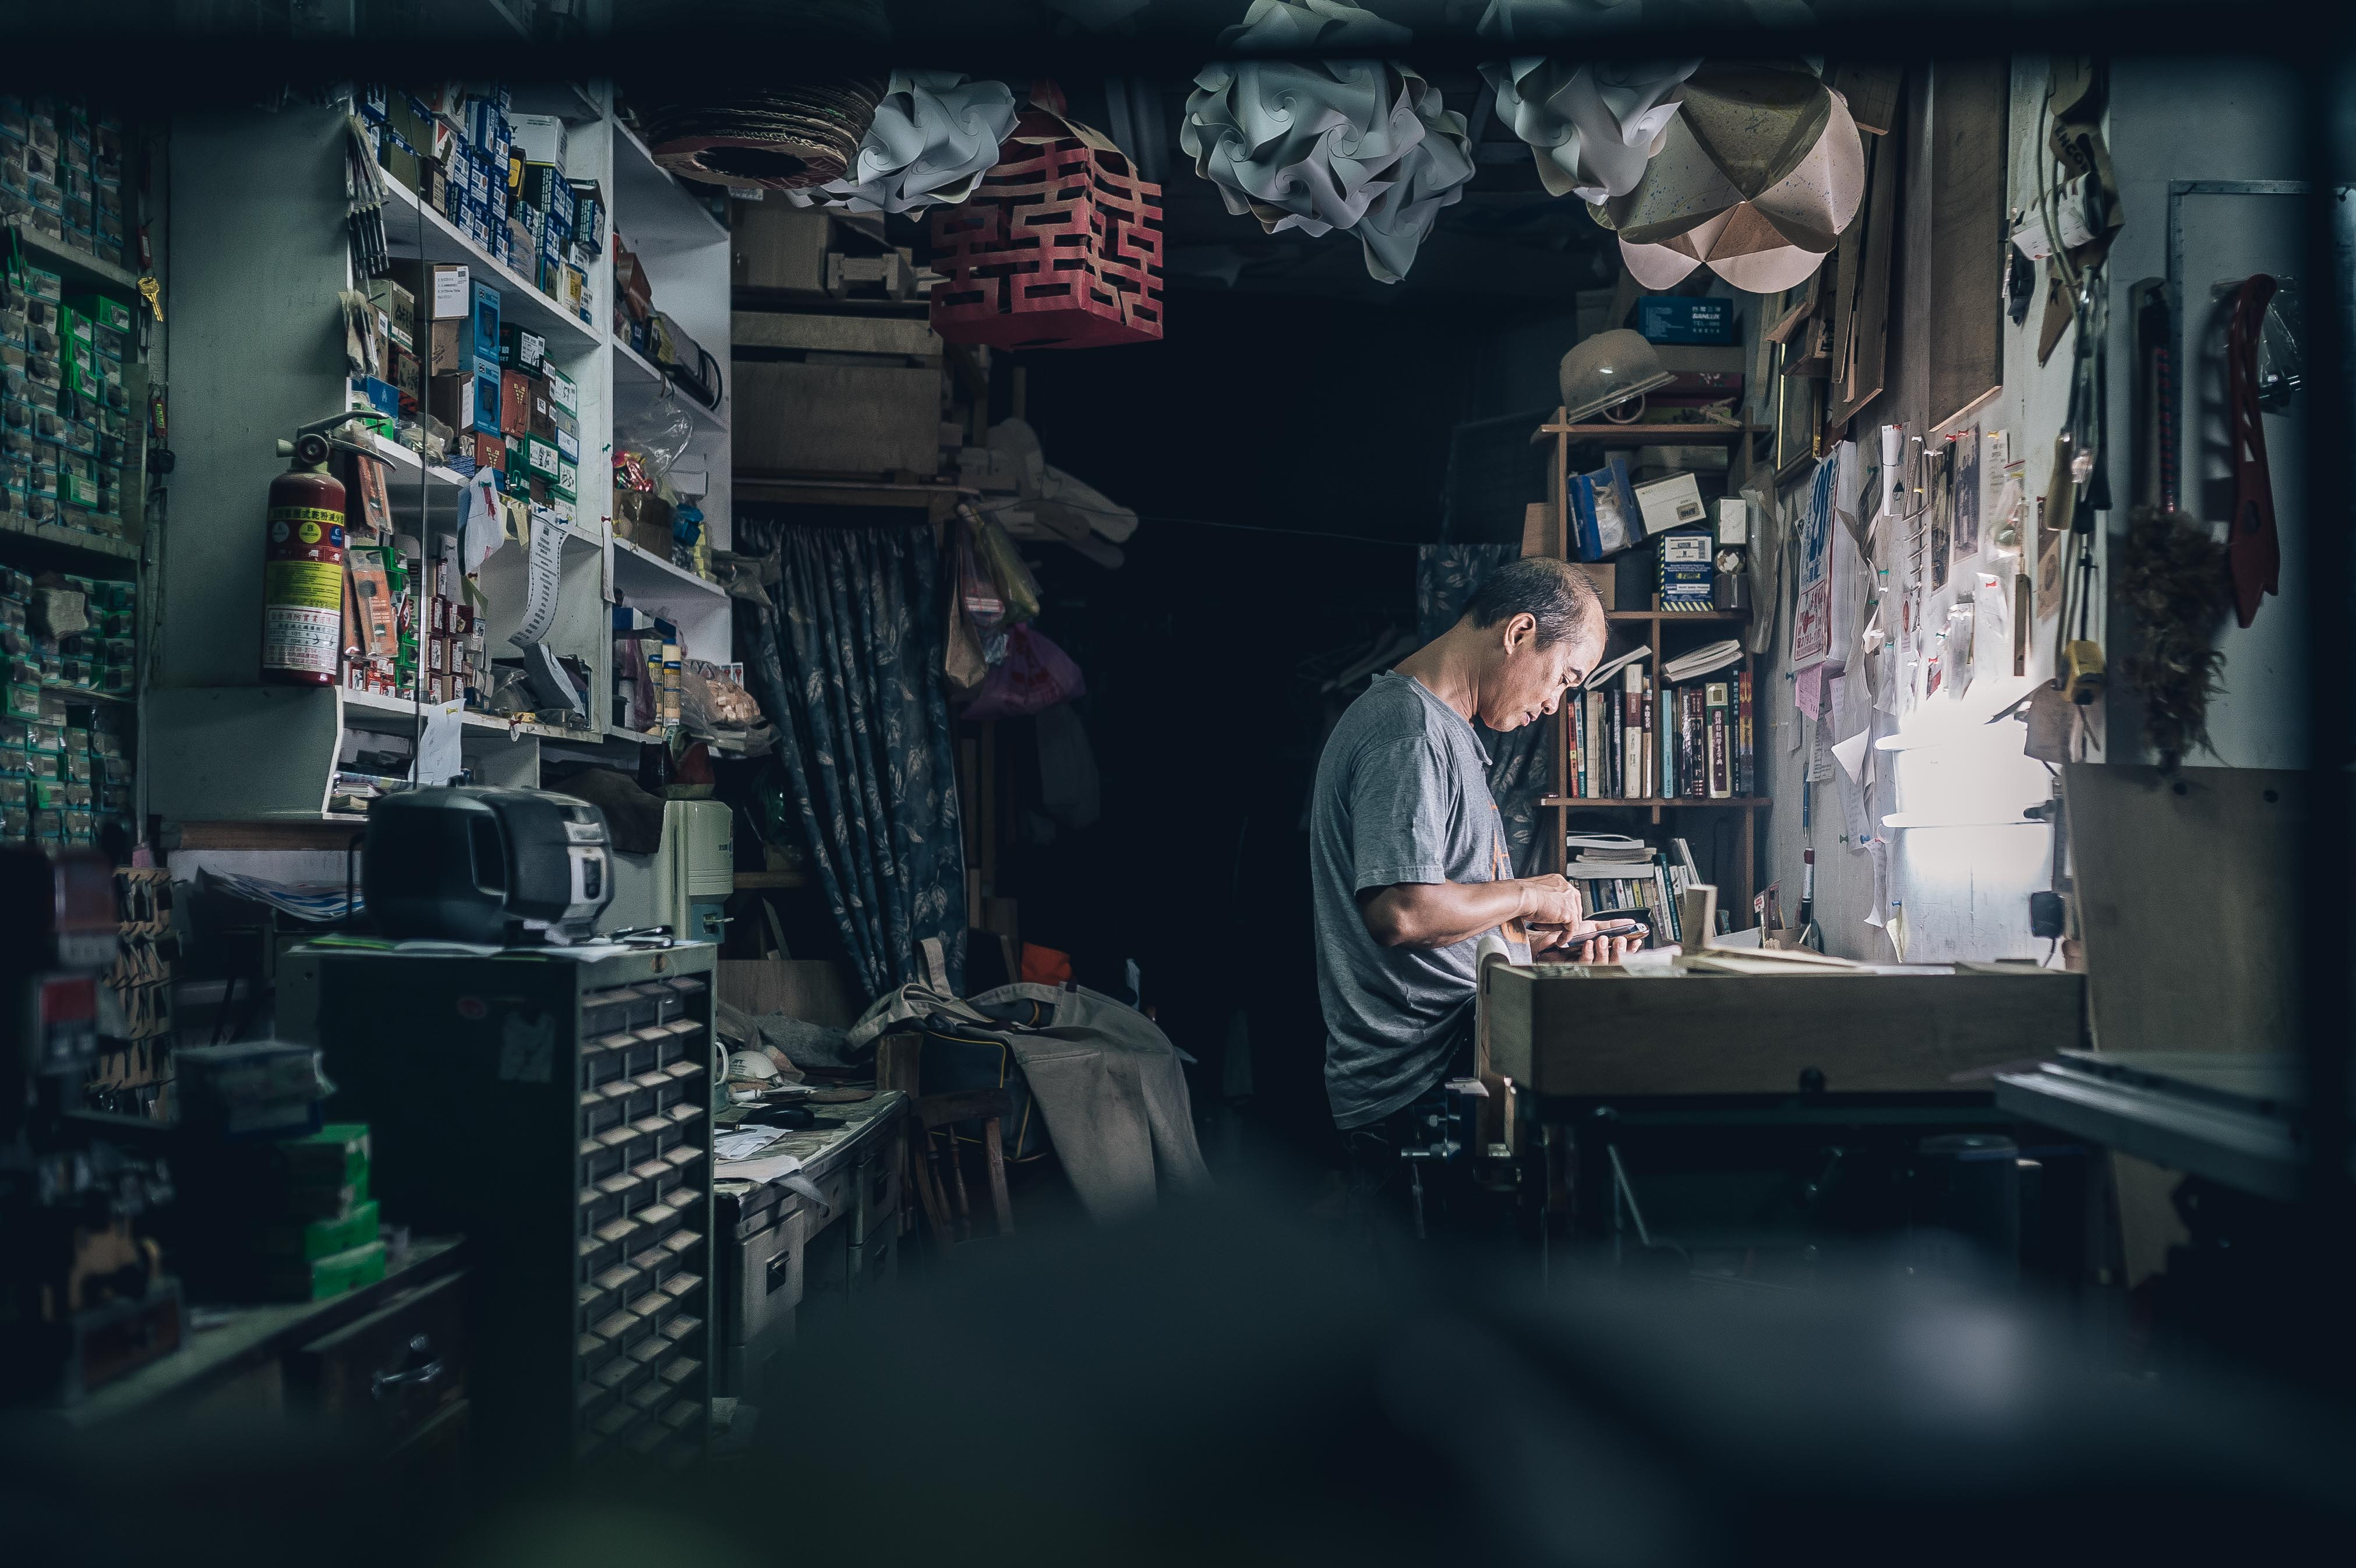 街拍心得分享 - (三) 概論篇   smallgiphotography